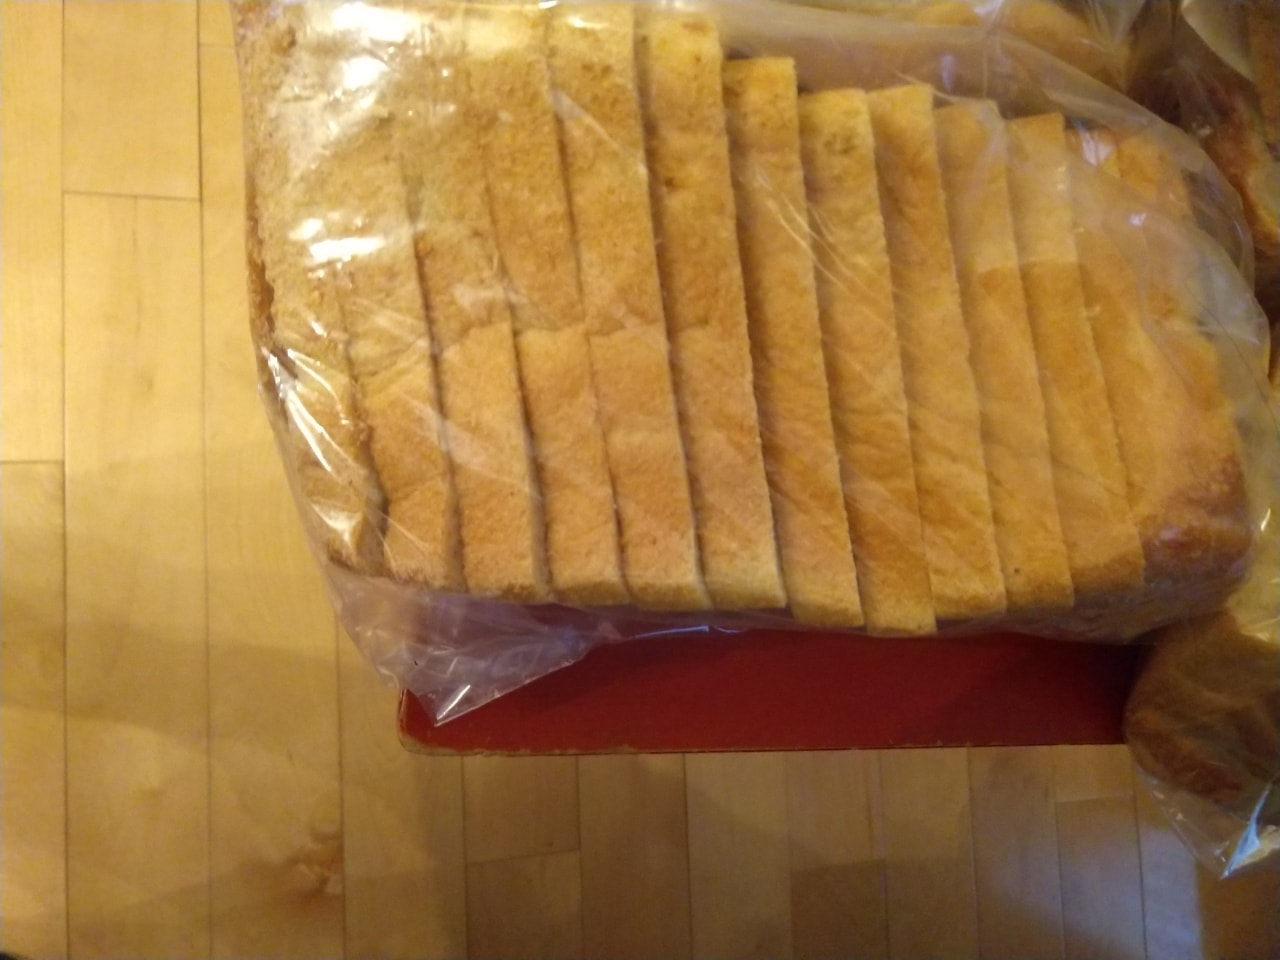 Vegan sourdough loaves and rolls